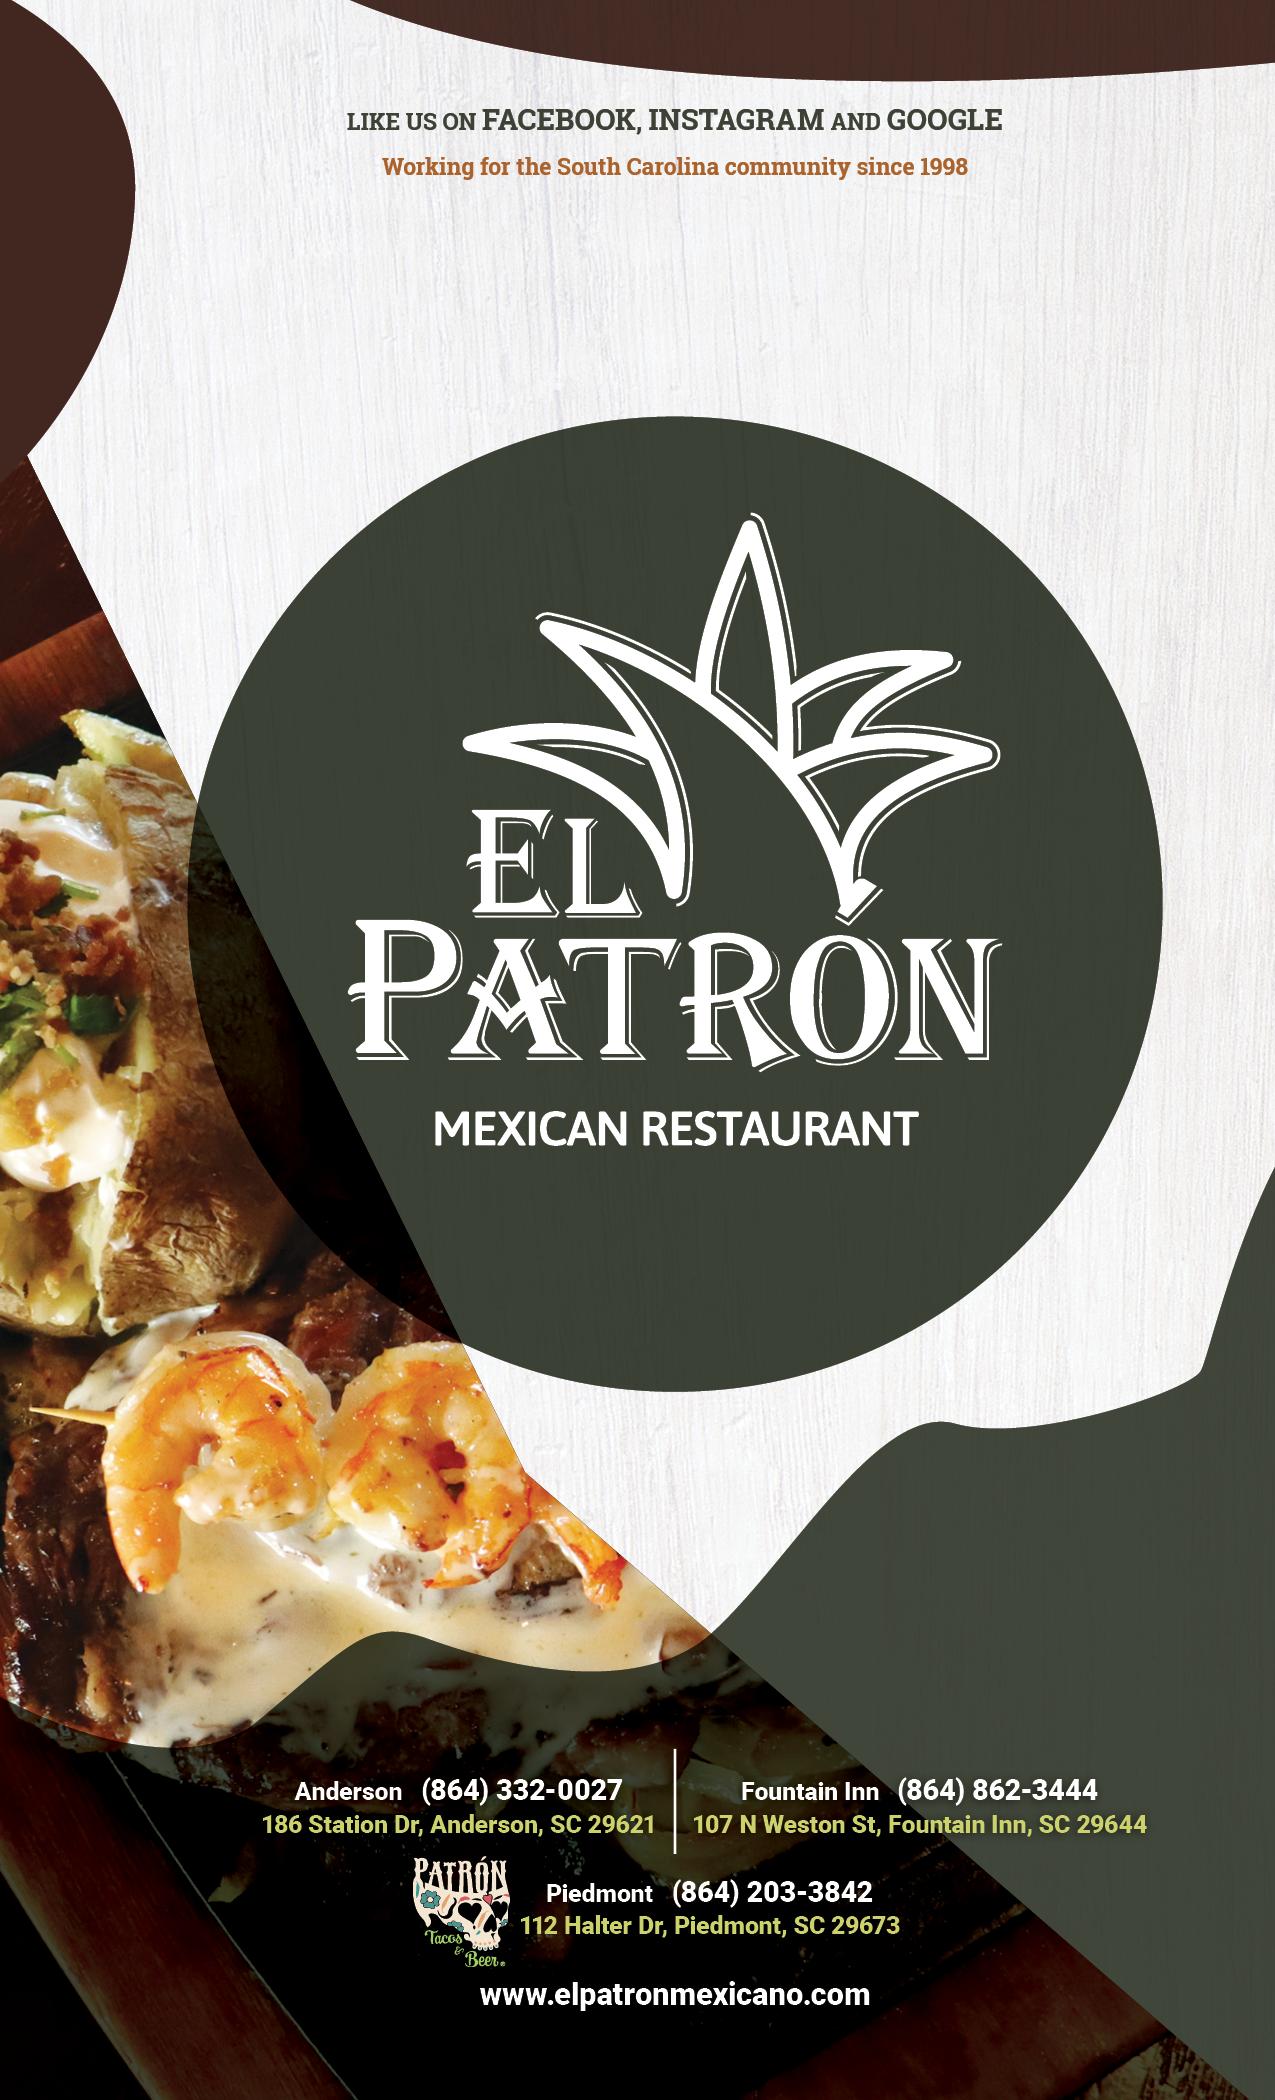 ElPatron-Foun:And-dinnermenu